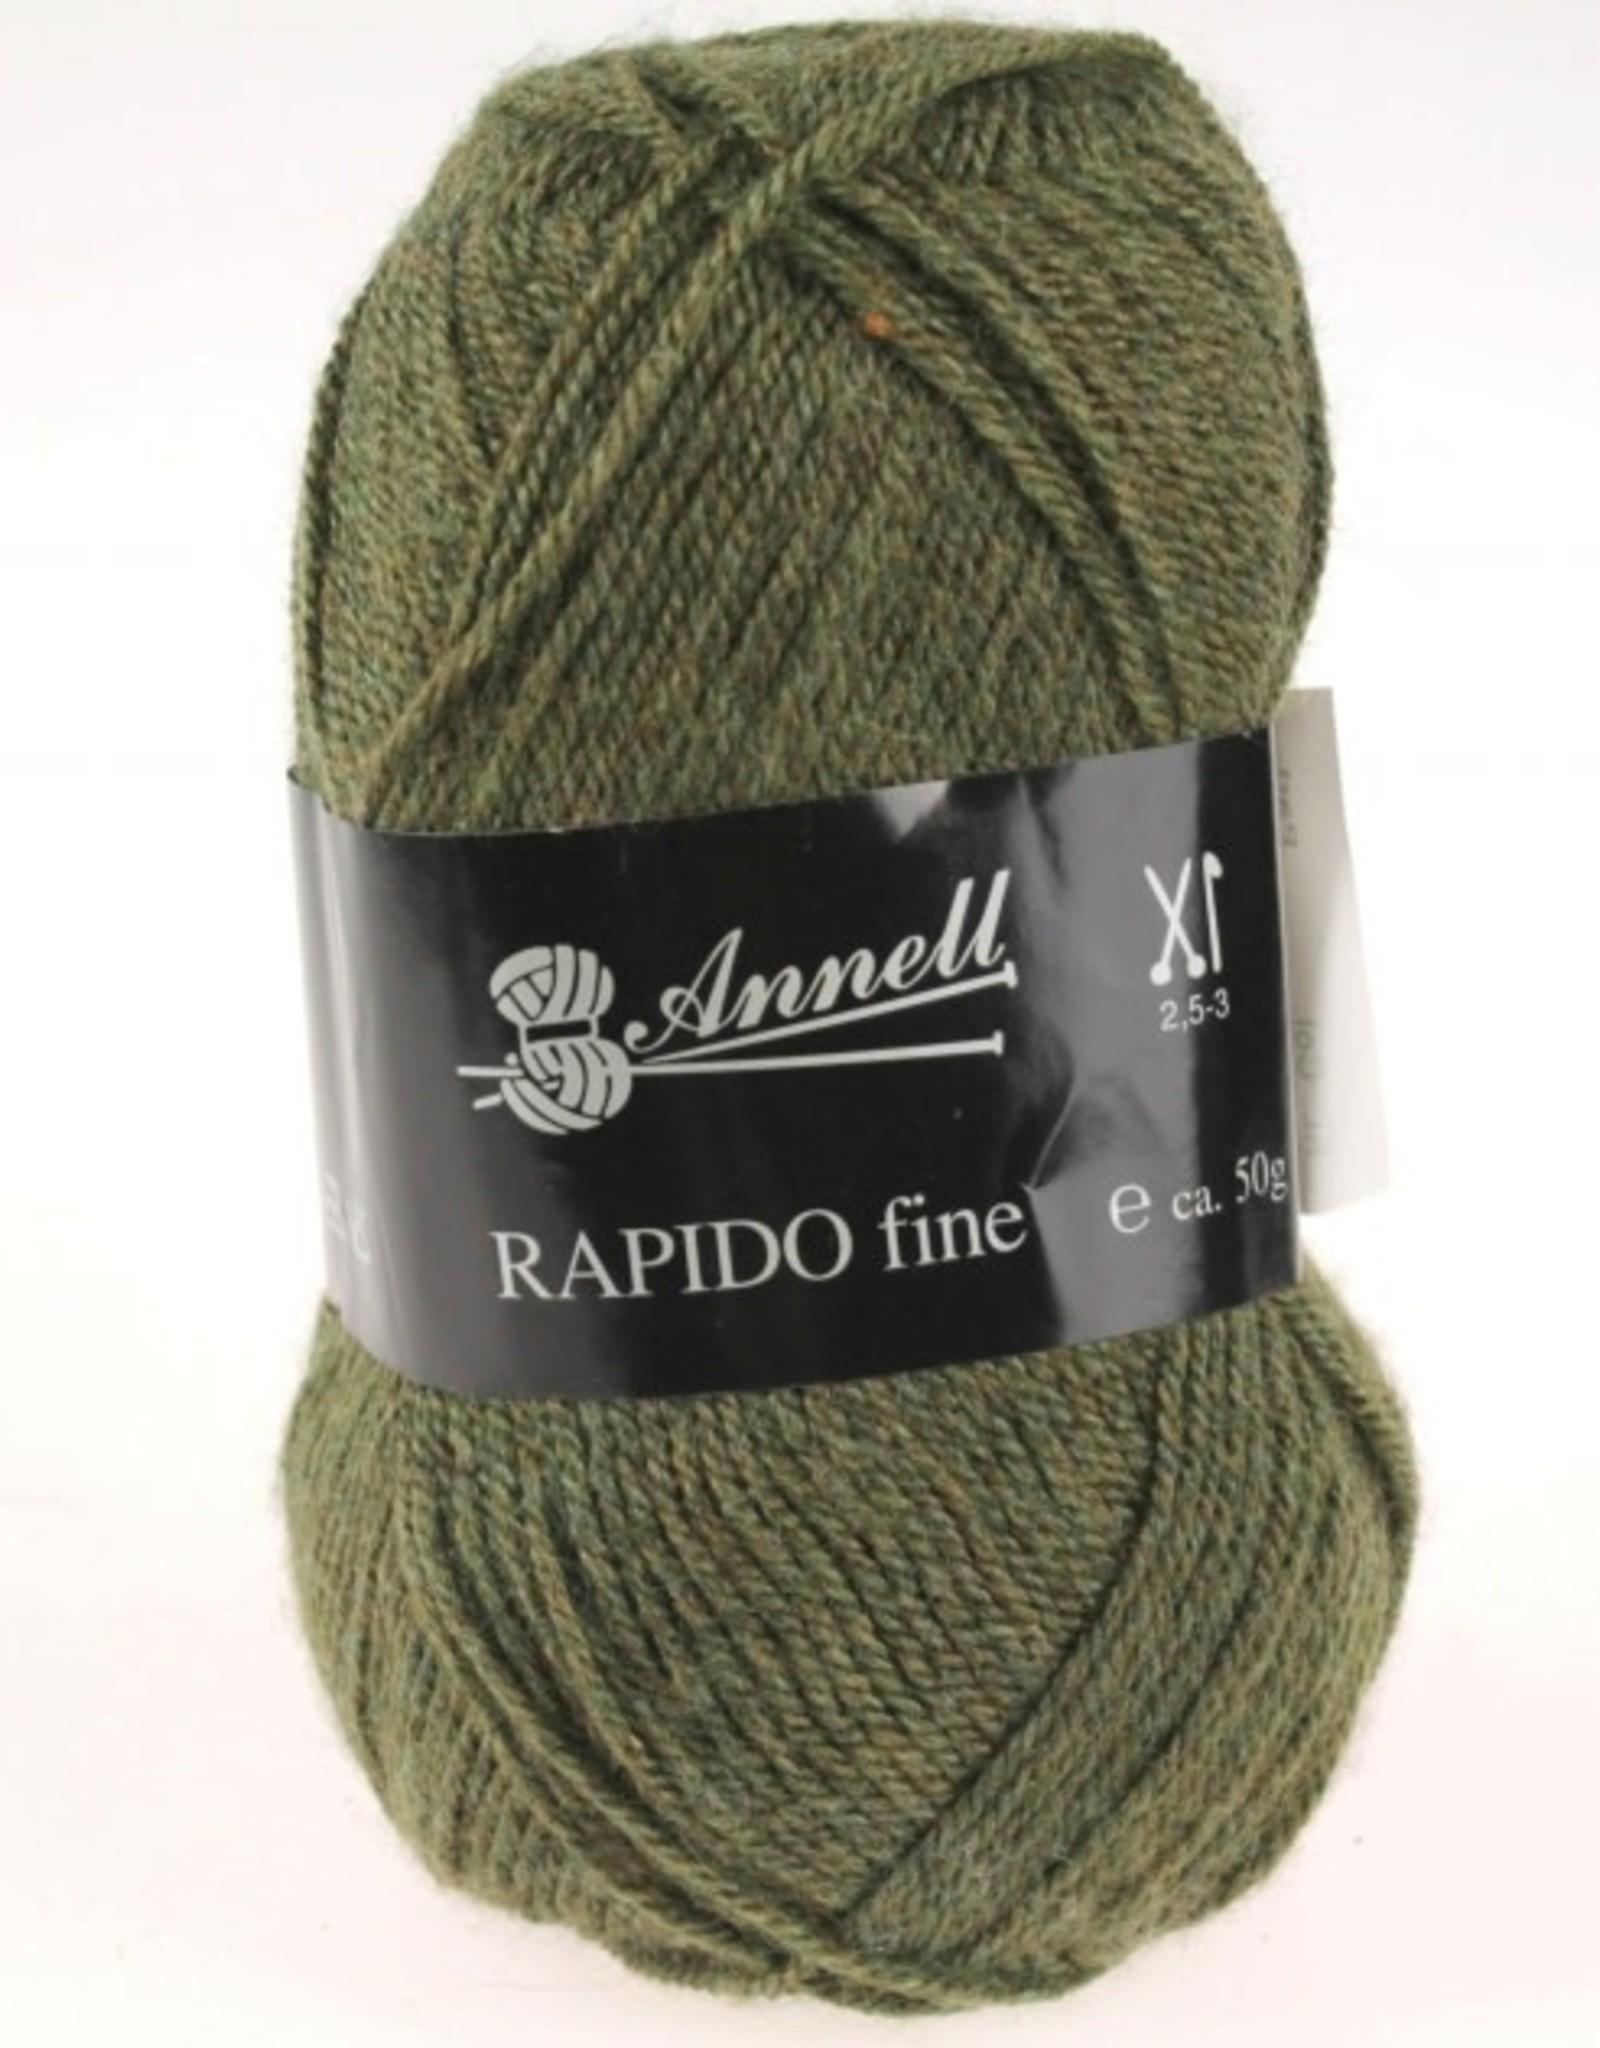 Annell Annell rapido fine 8349